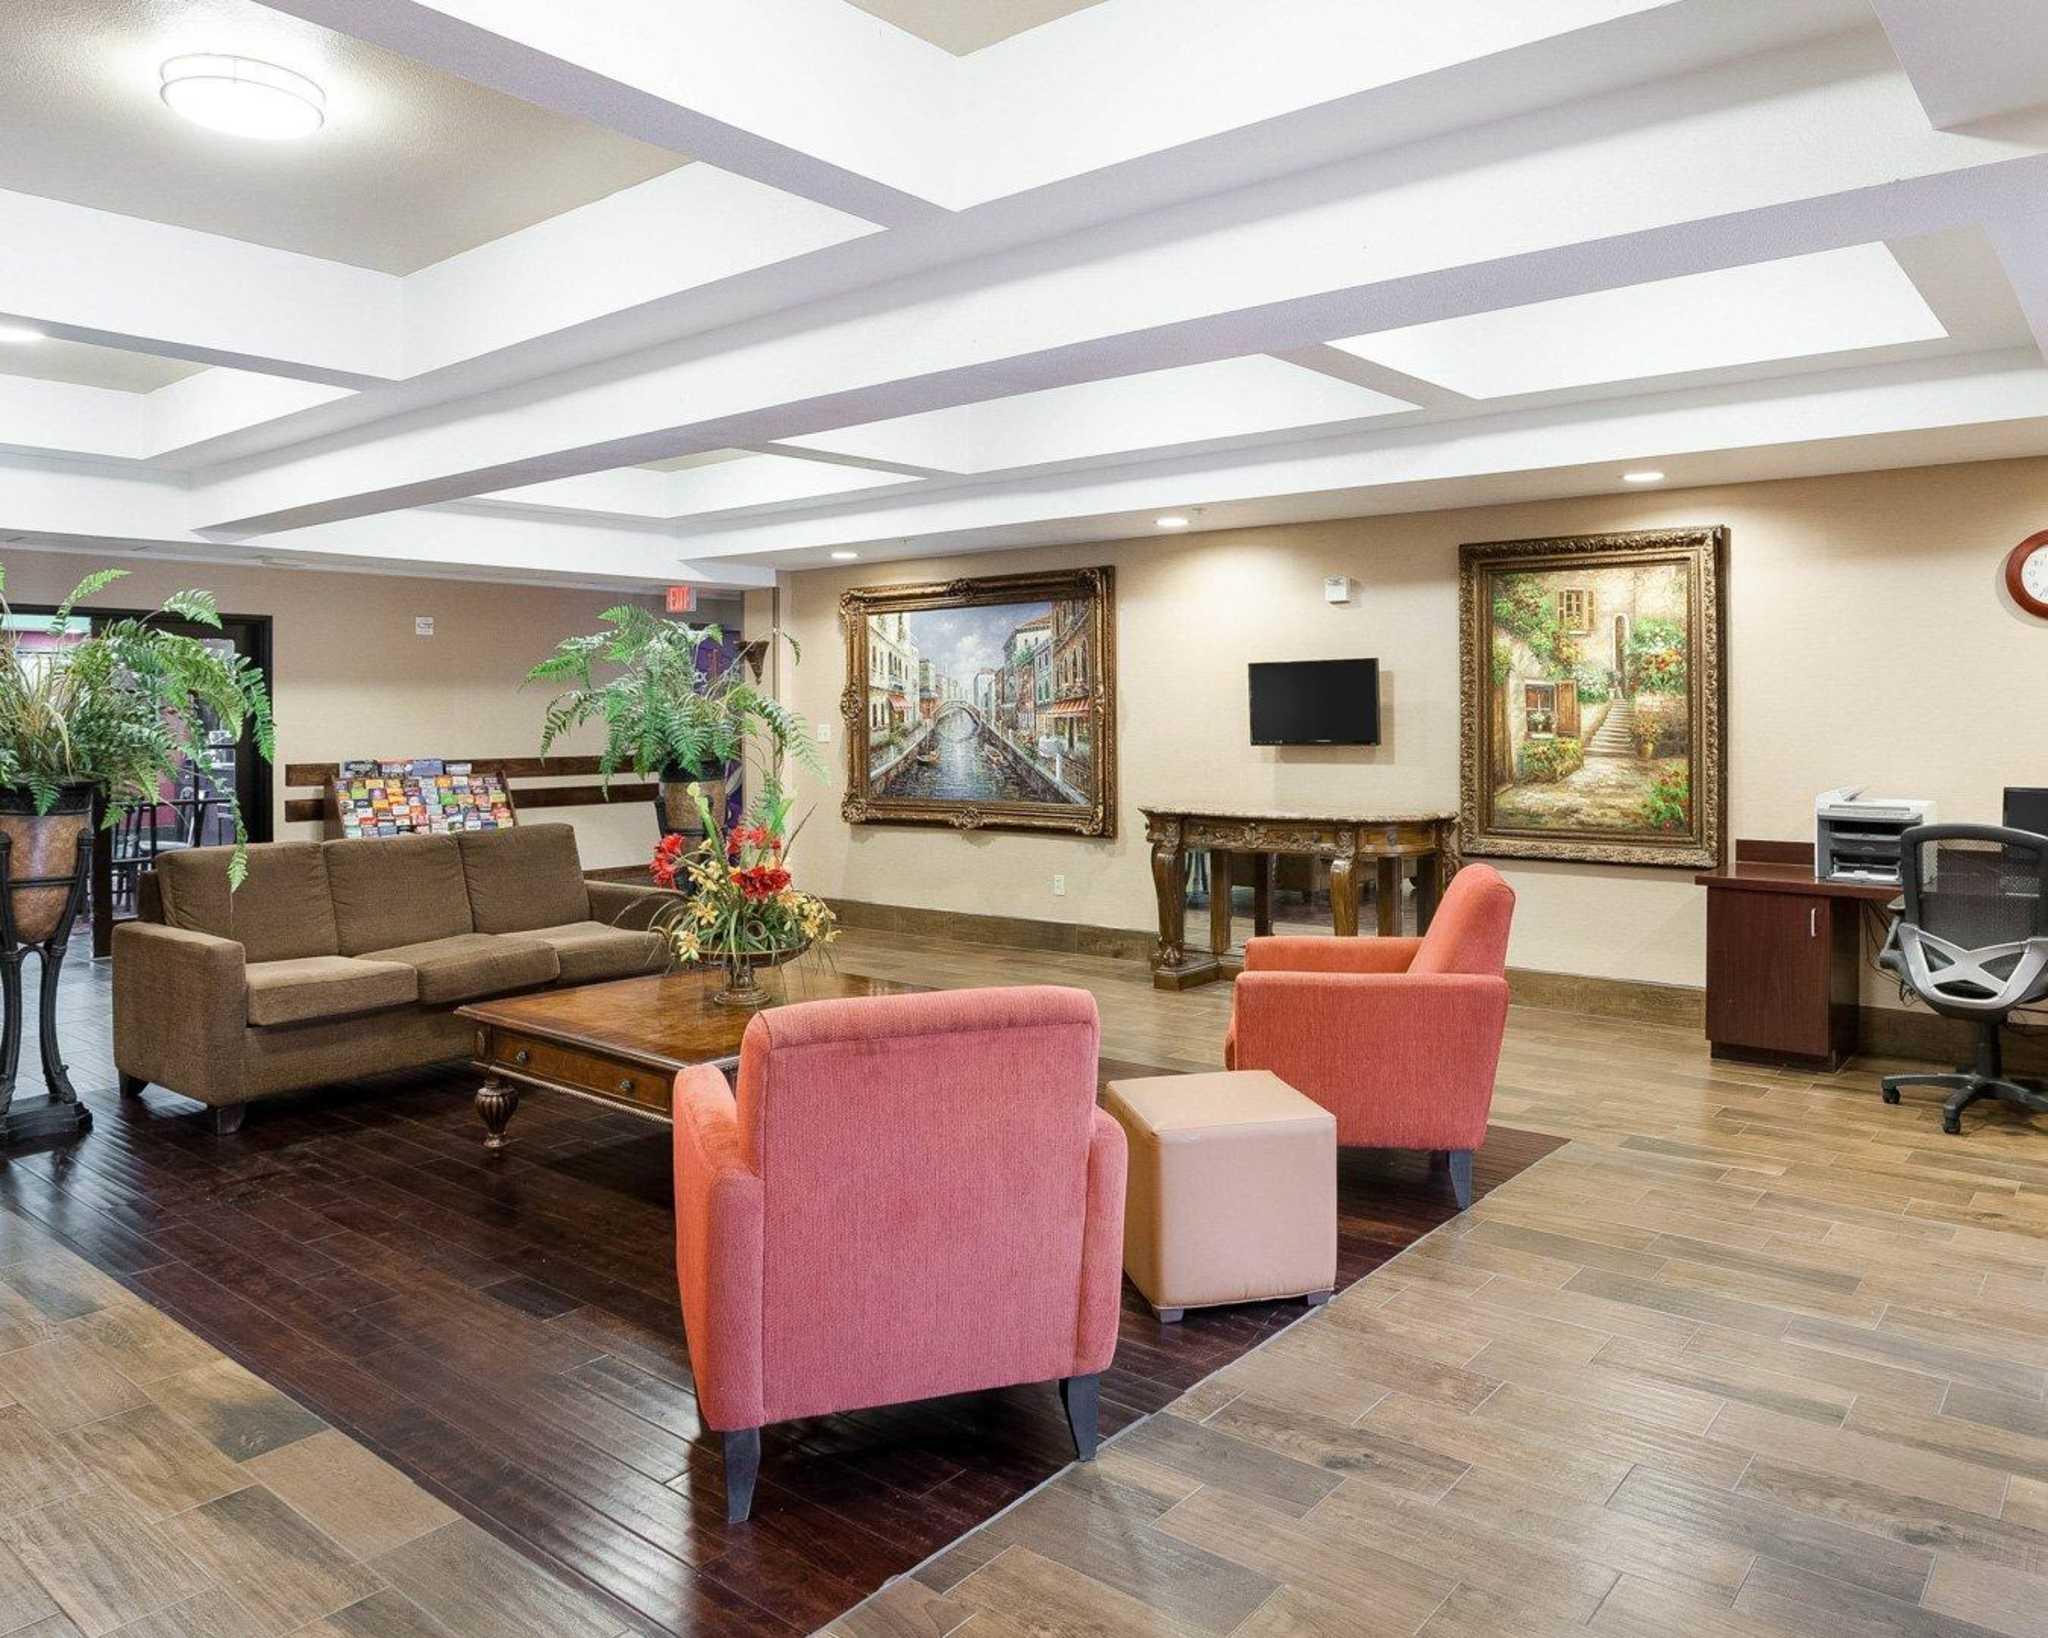 Comfort Inn & Suites Near Medical Center image 11